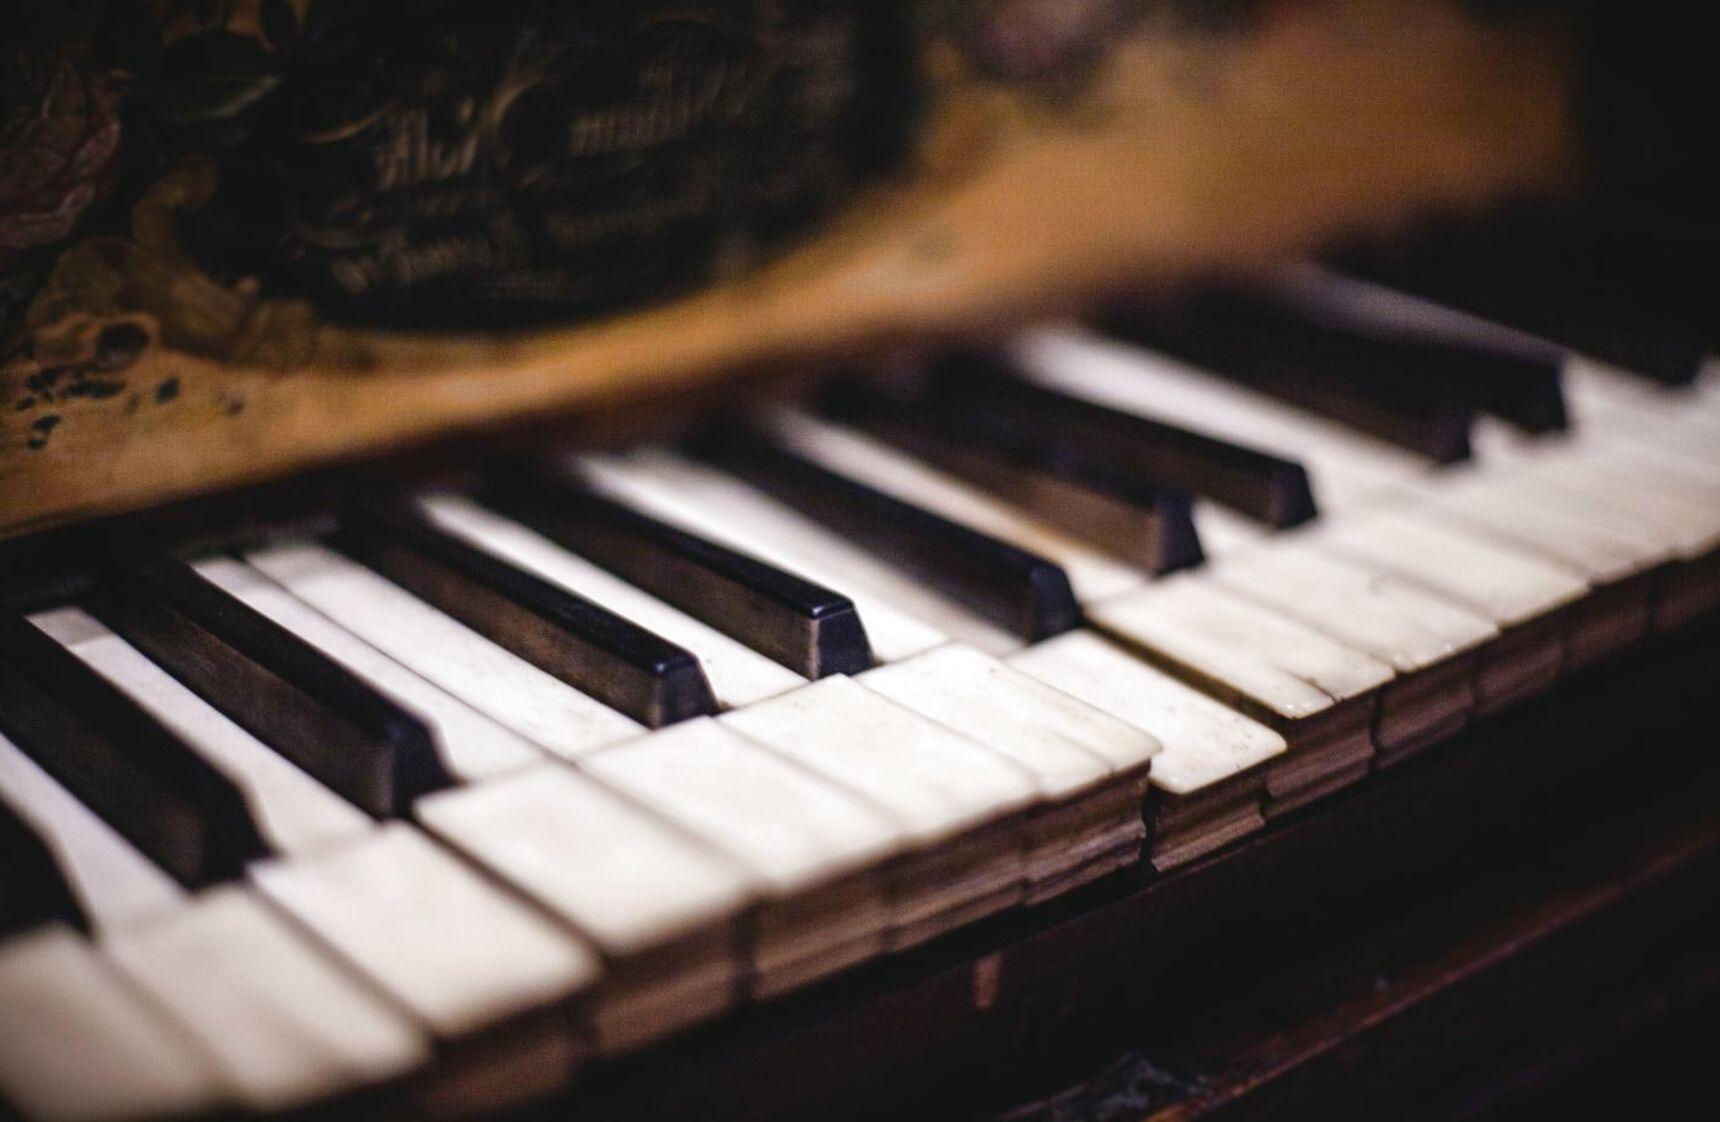 ivory piano keys for sale